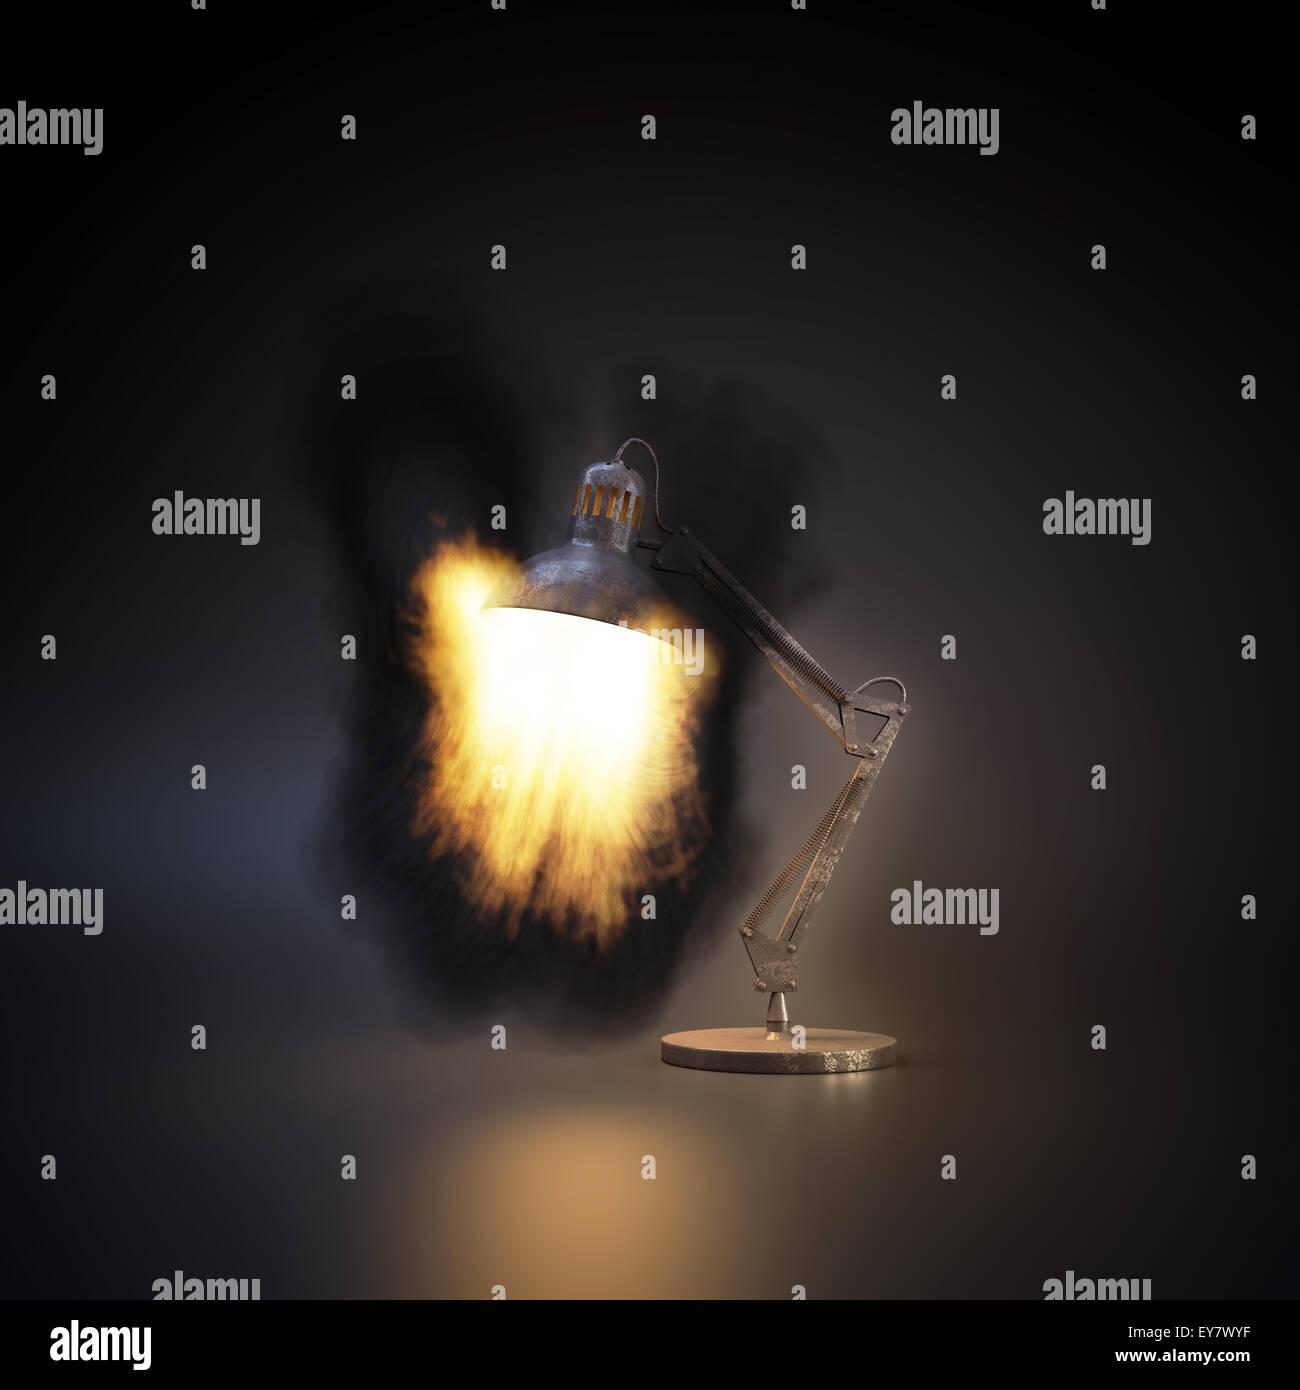 Blazing Fire d'une lampe de bureau Photo Stock